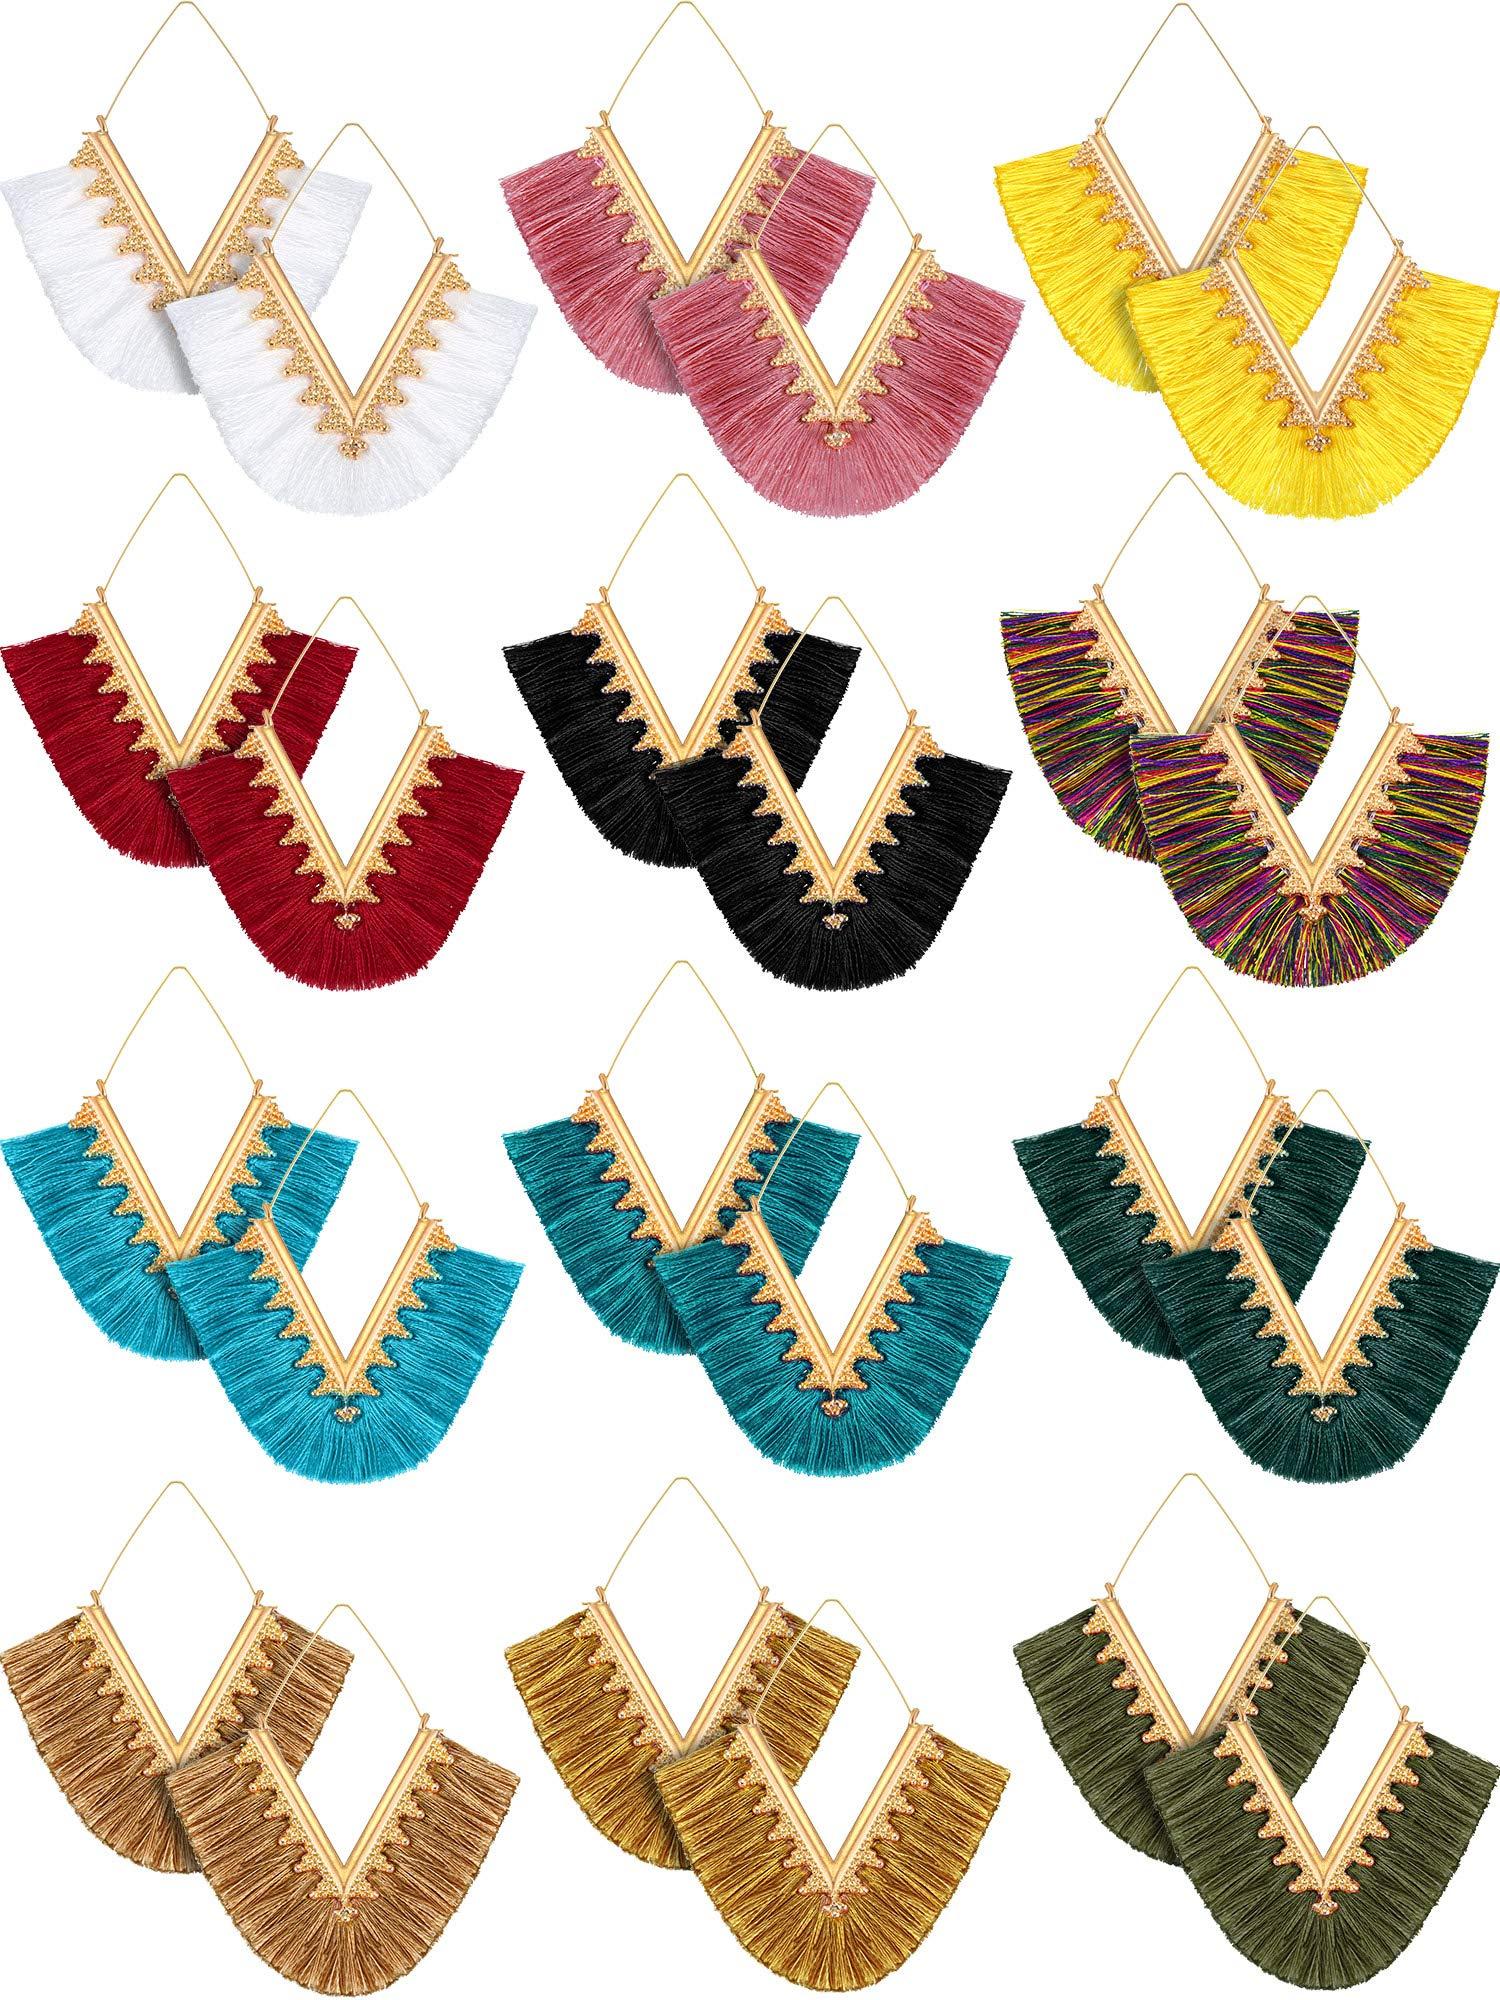 12 Pairs Statement Tassel Earrings Hoop Tassel Earrings Bohemian Geometric Handmade Triangle Earrings for Women Girls (Style 1) by Hicarer